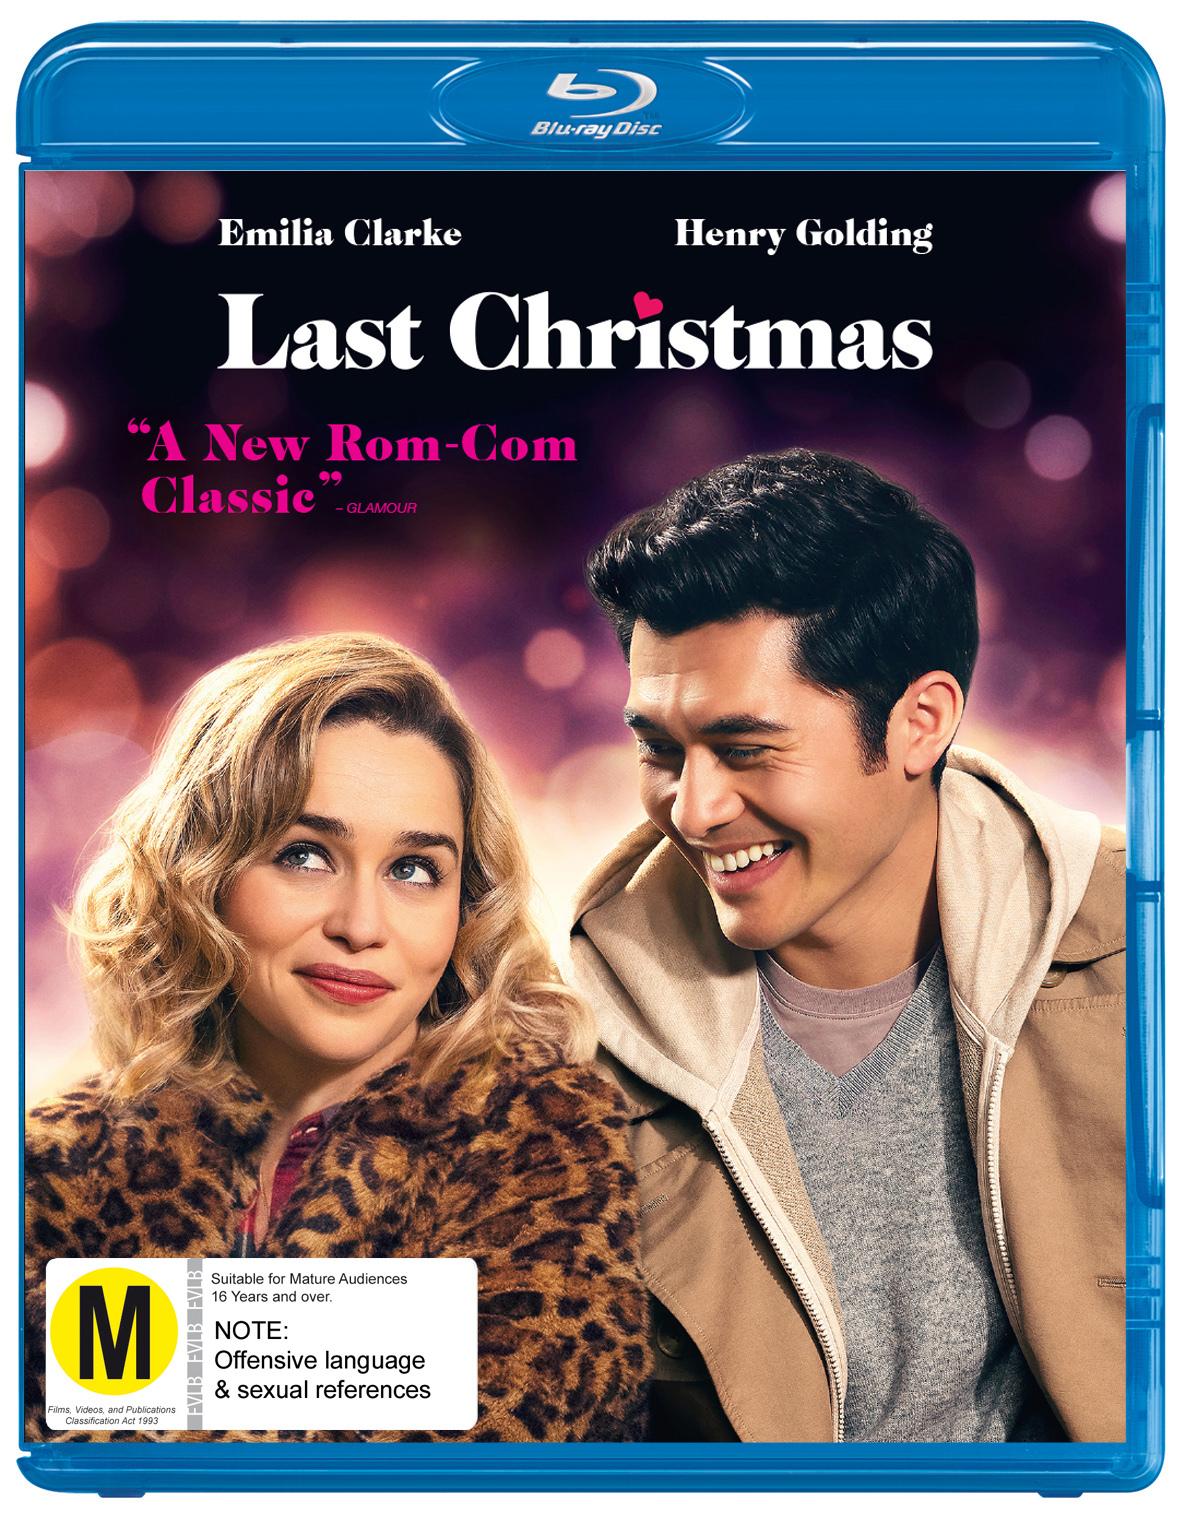 Last Christmas on Blu-ray image